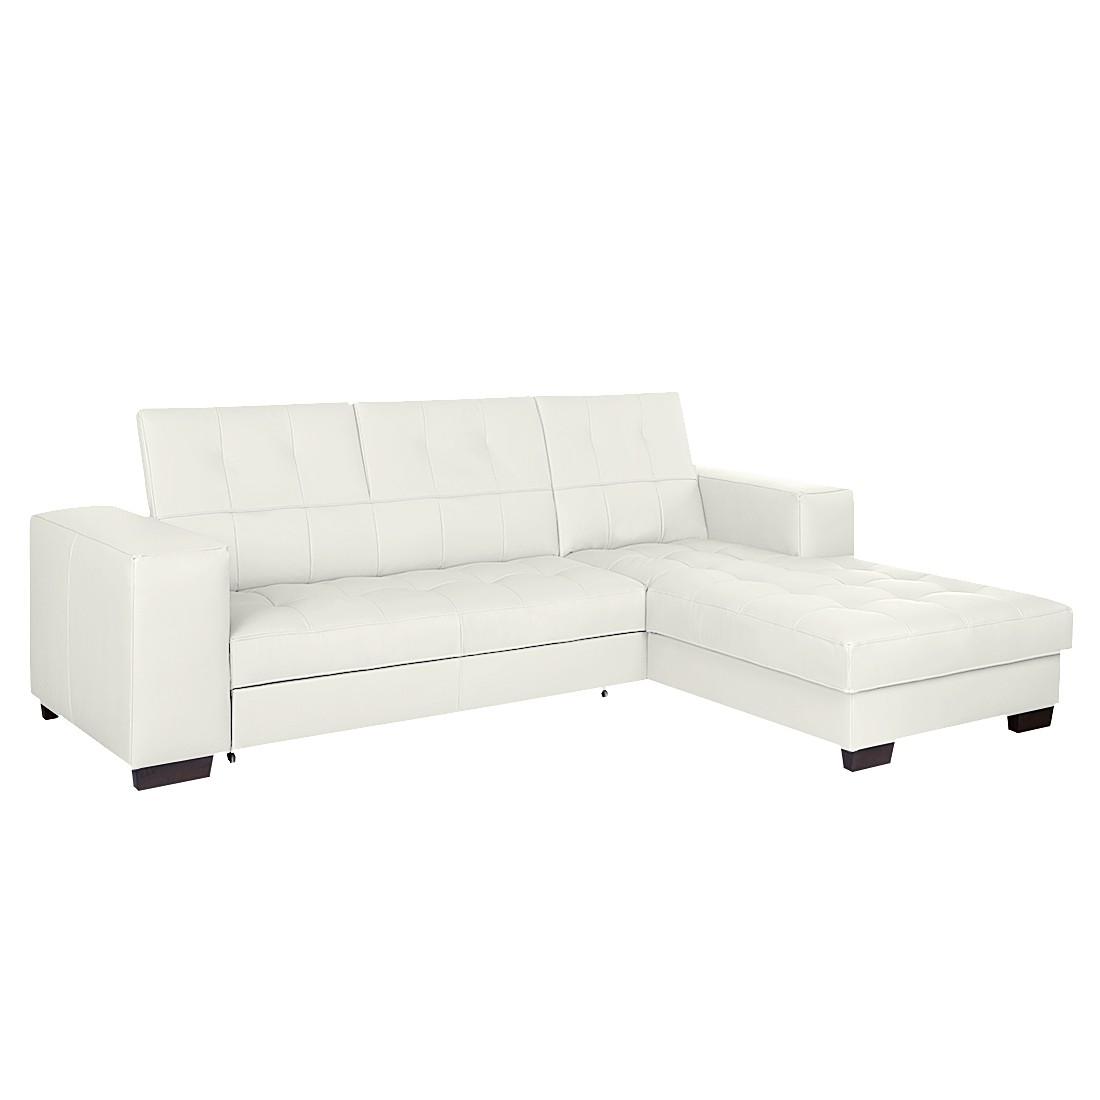 sofas mit schlaffunktion g nstig kaufen. Black Bedroom Furniture Sets. Home Design Ideas